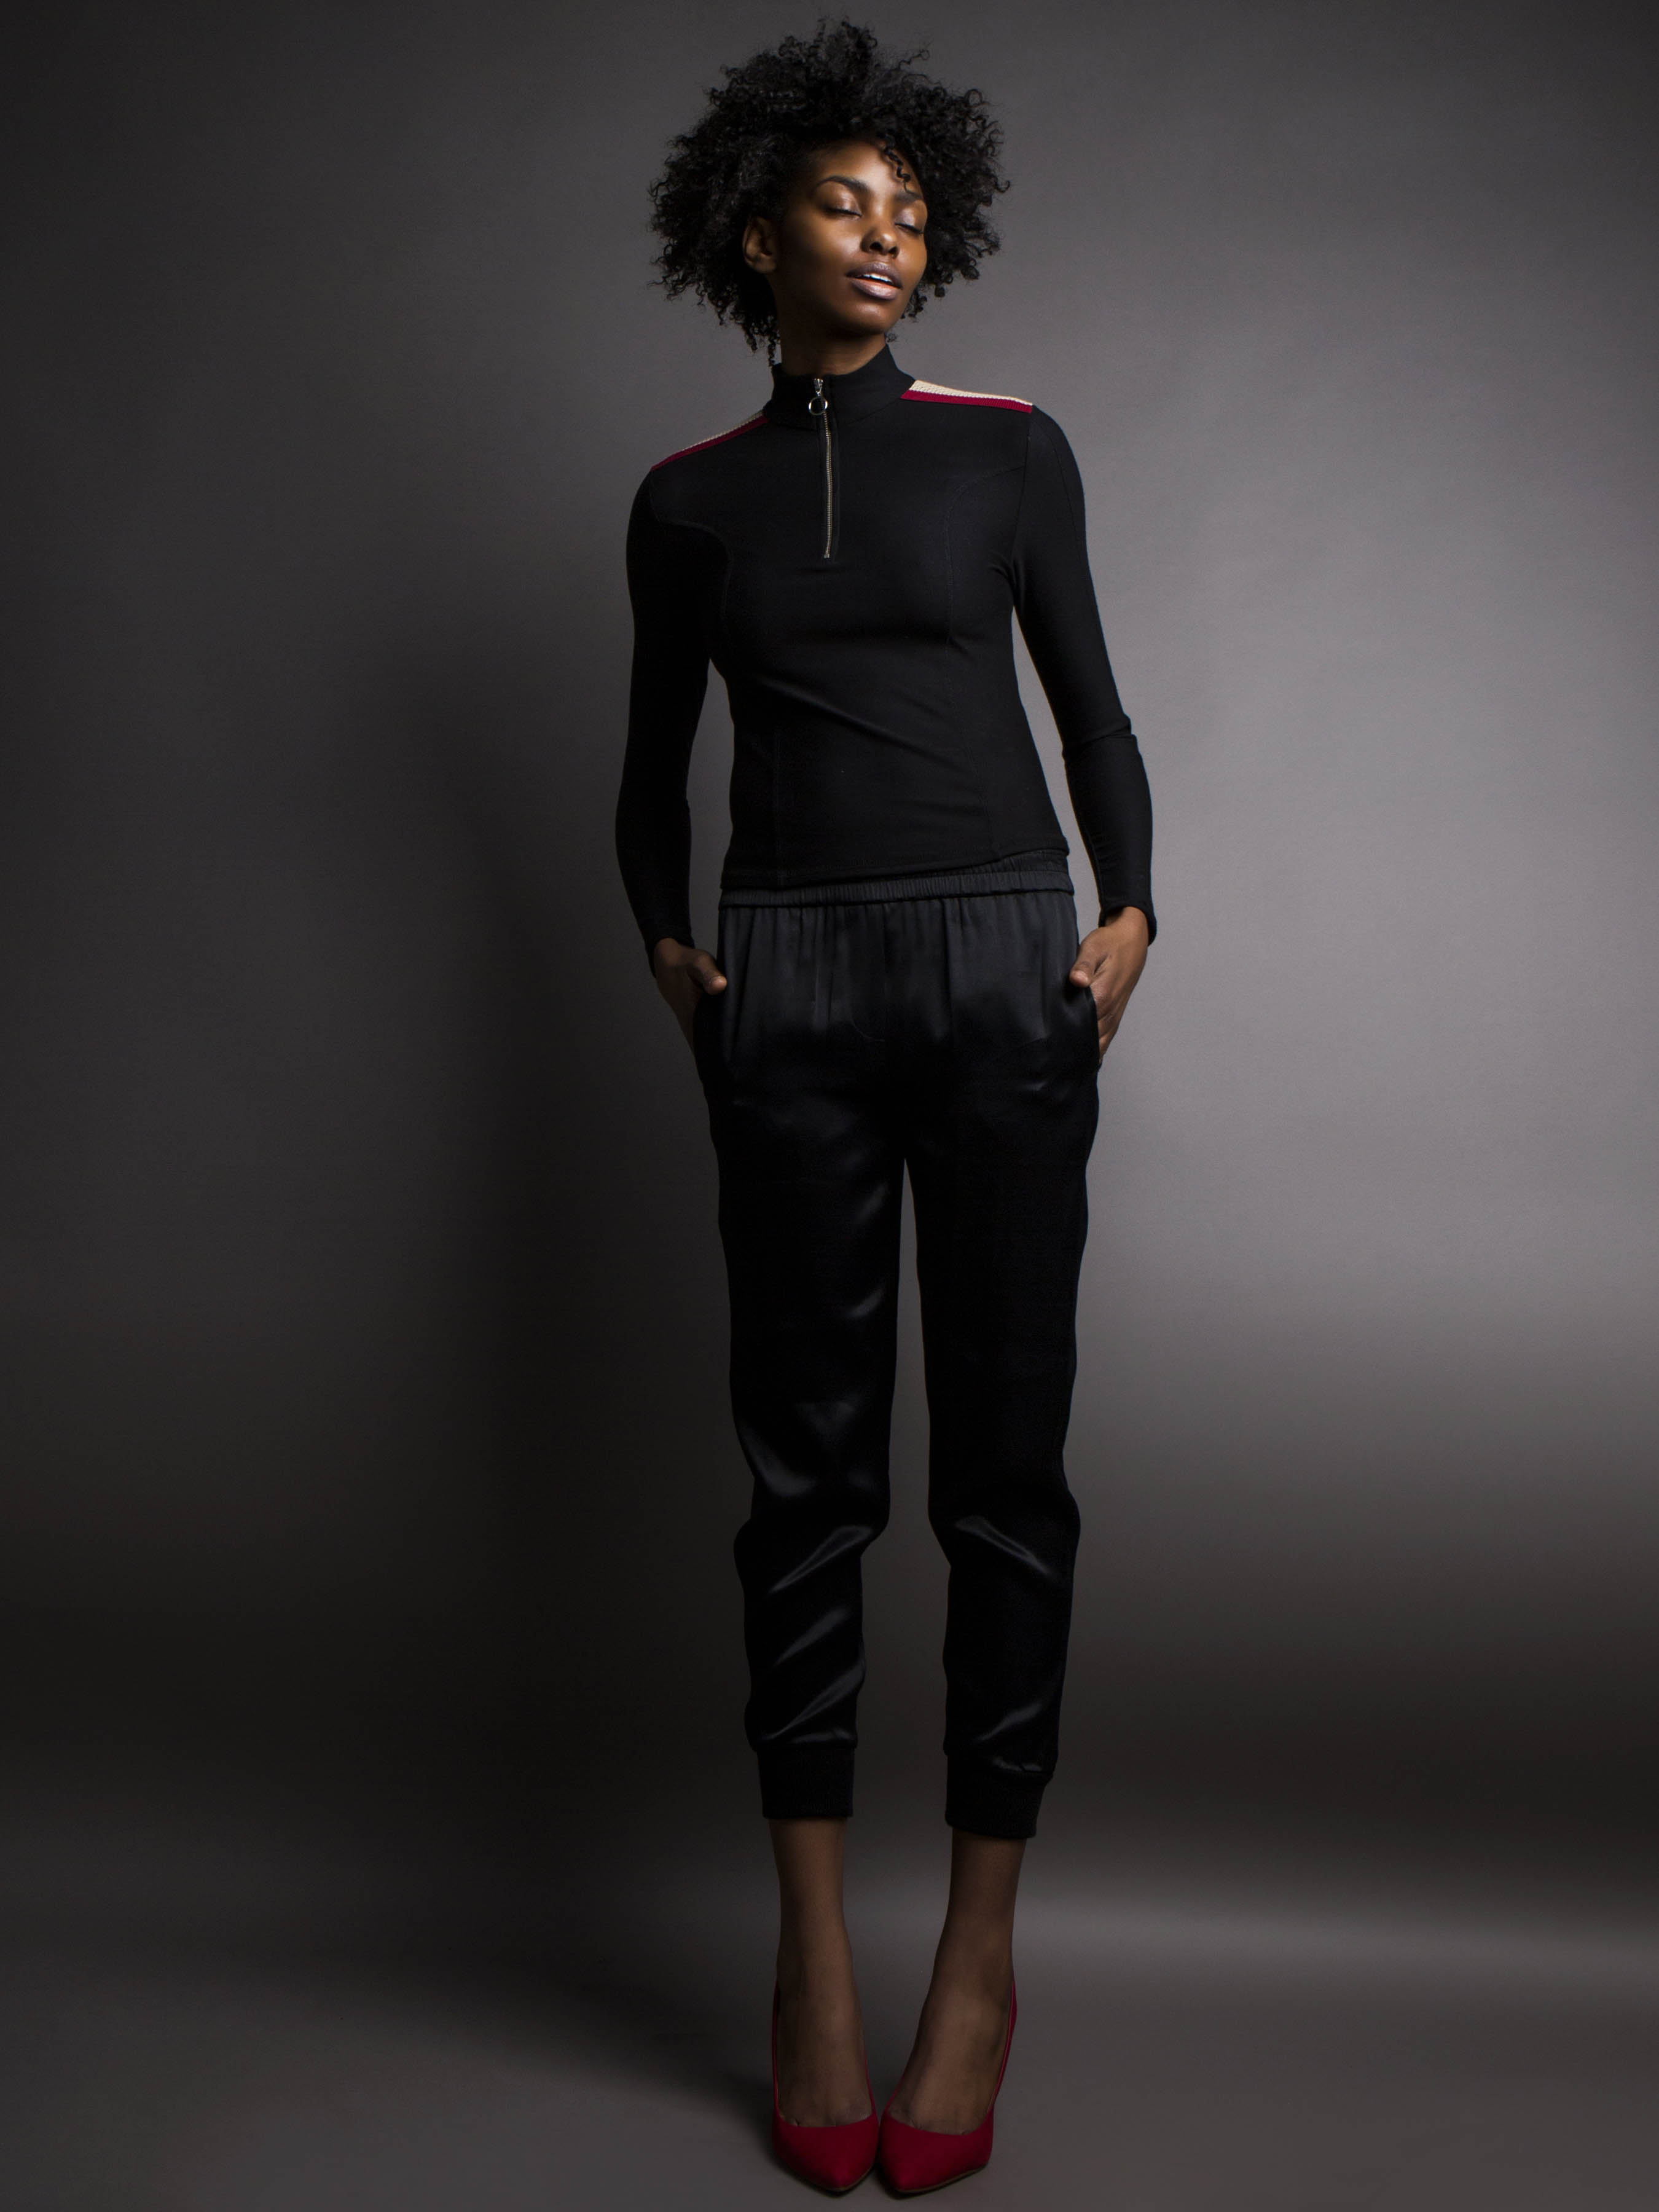 Adaora-new_york_models-1